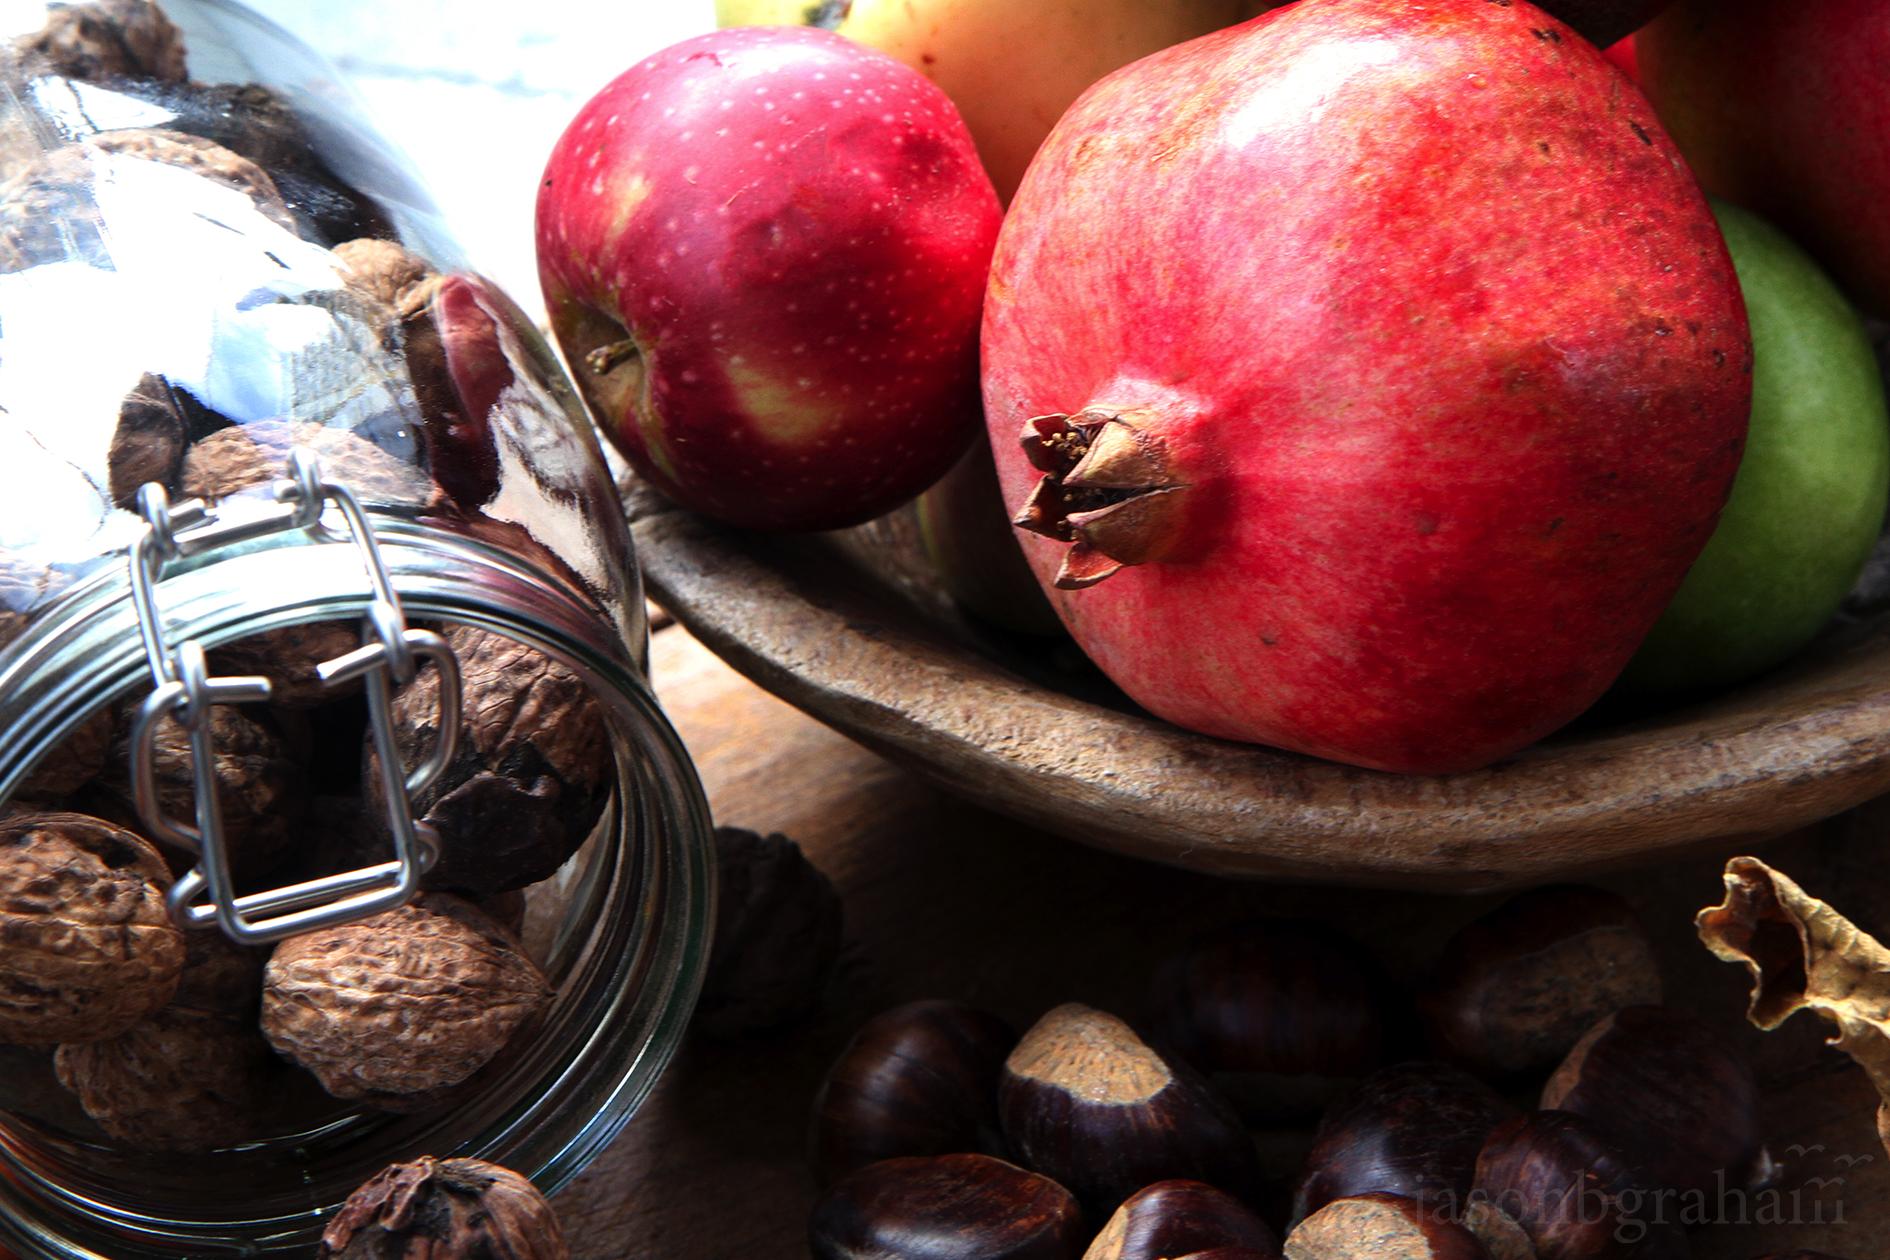 pomegranate-nar-2078